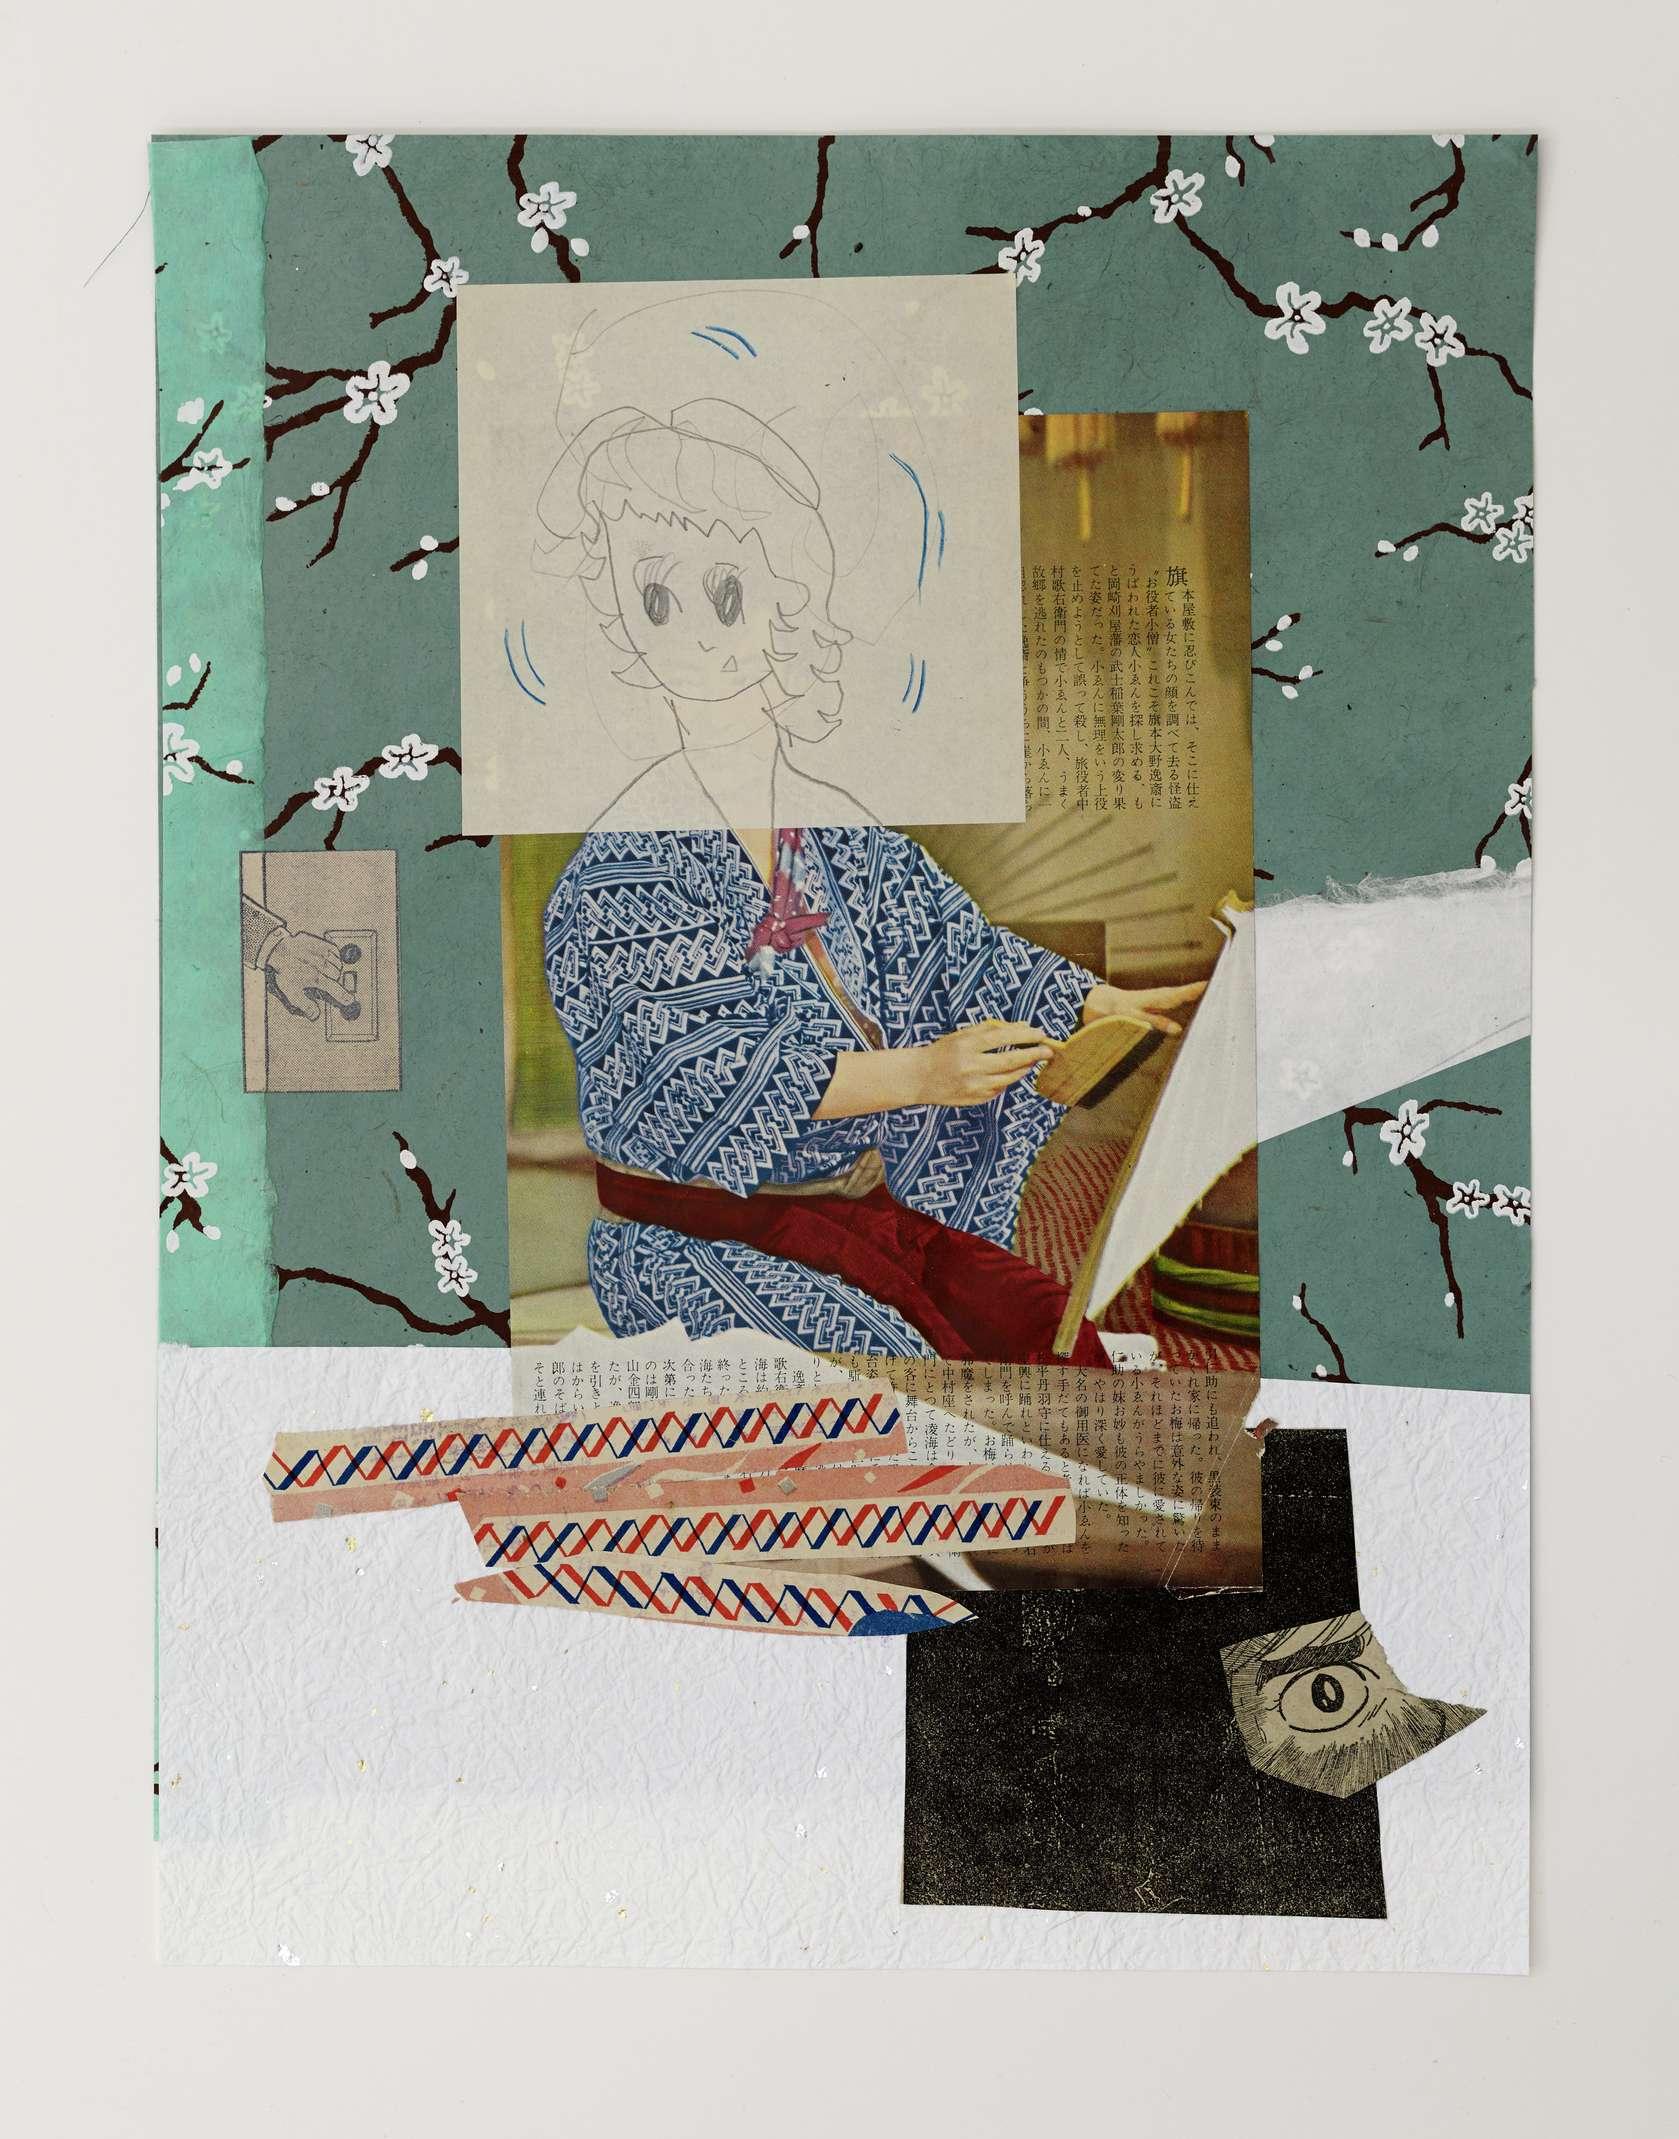 Hippolyte Hentgen, Sanjo Dori, 2019 Collage sur papier39.5 × 30 cm / 15 1/2 × 11 6/8 in.